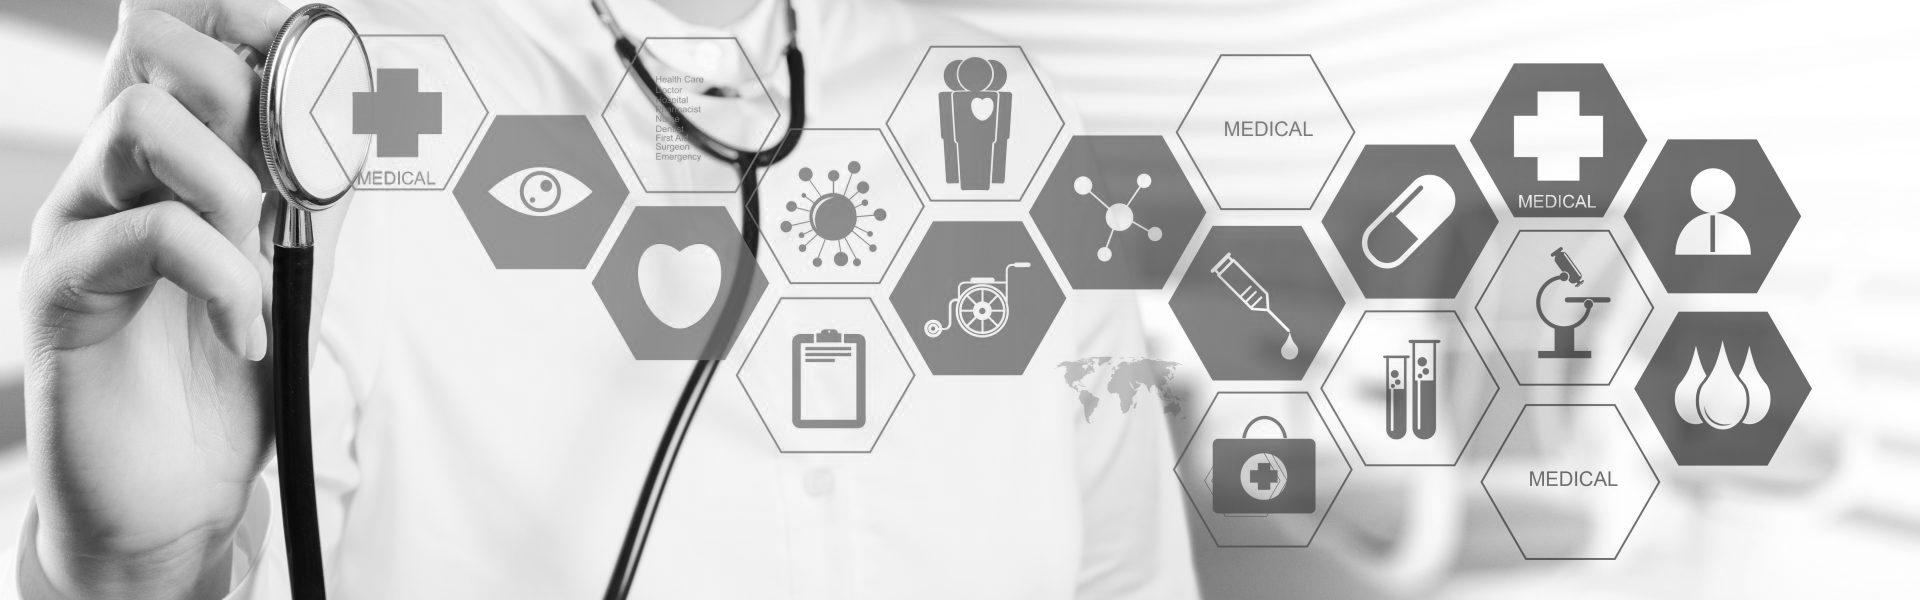 NPC-Medical-Services-Image-P1